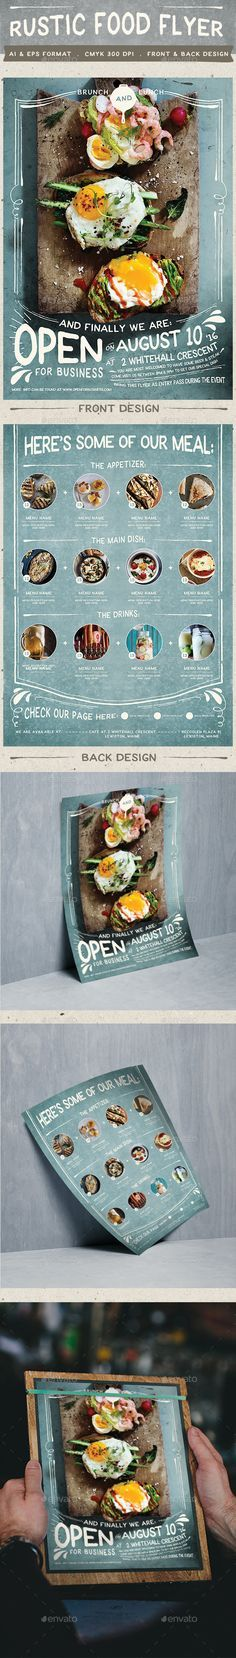 Rustic Food Promo Flyer Template #design Download: http://graphicriver.net/item/rustic-food-promo-flyer/12482053?ref=ksioks